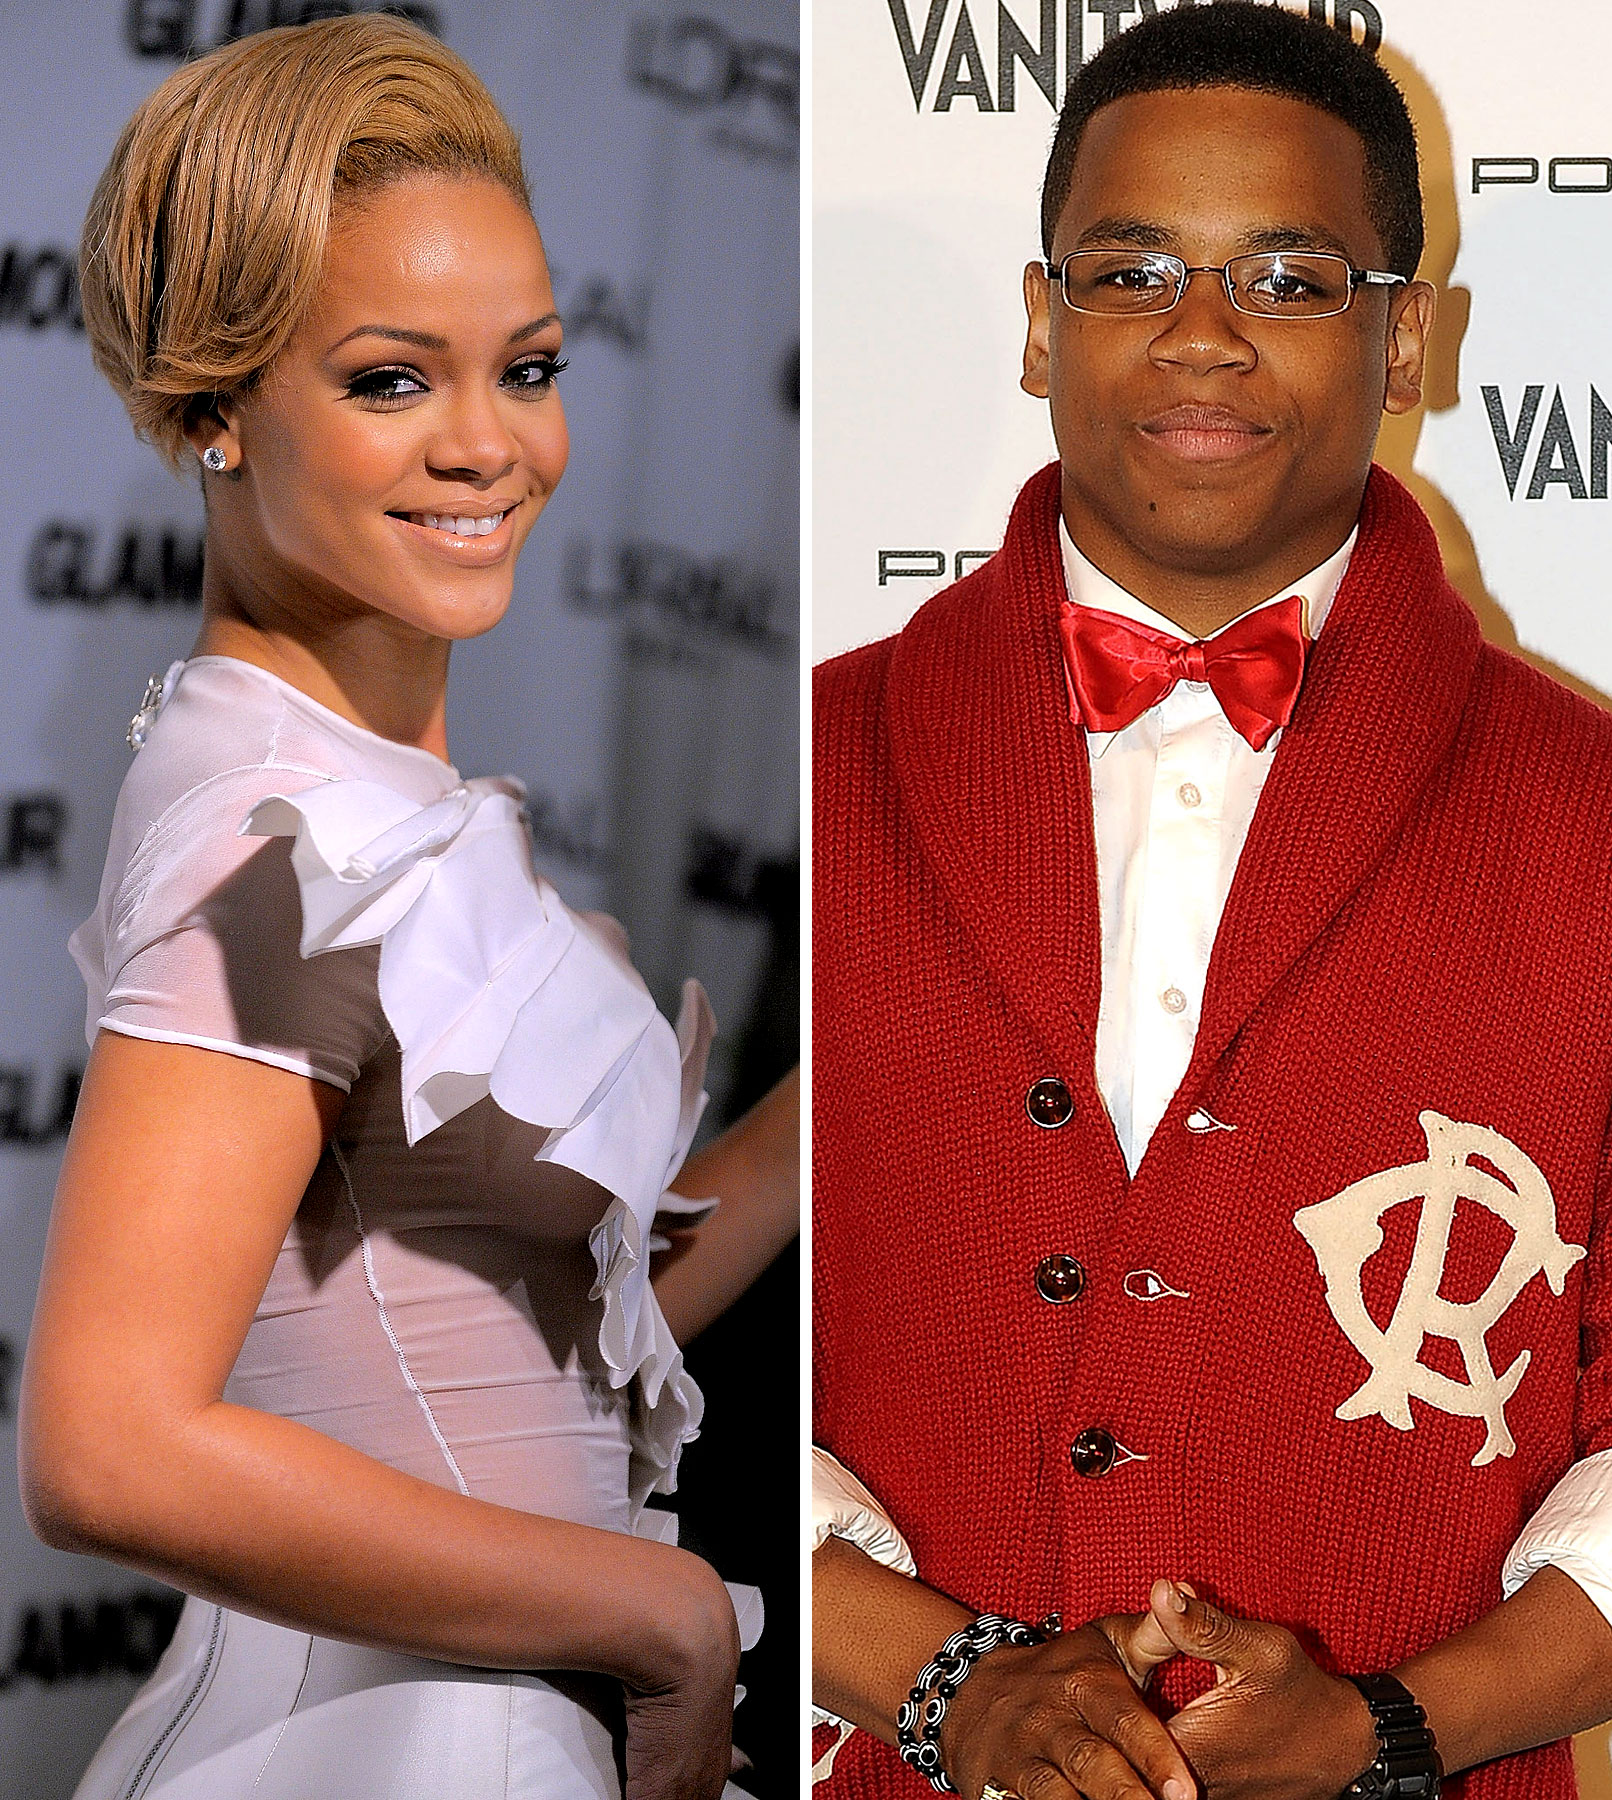 Hookup Alert: Rihanna And Tristan Wilds